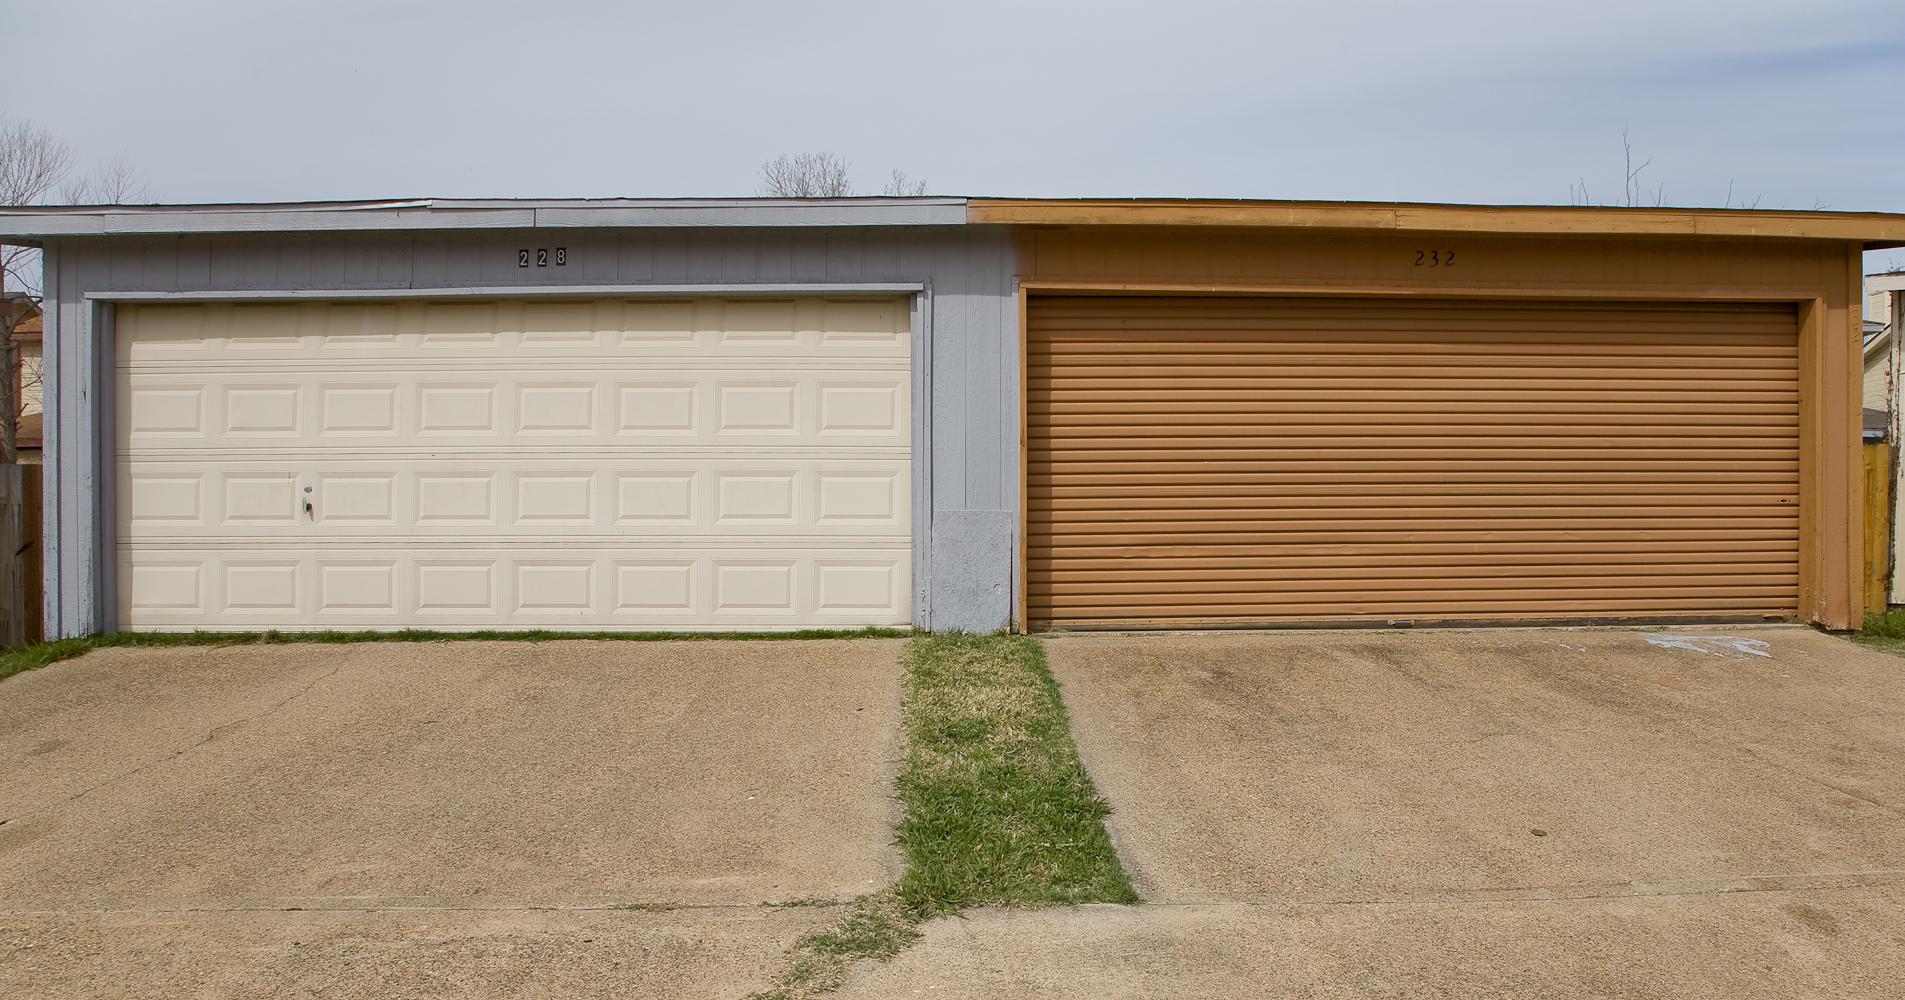 Duplex Homes 2 (7 of 9).jpg